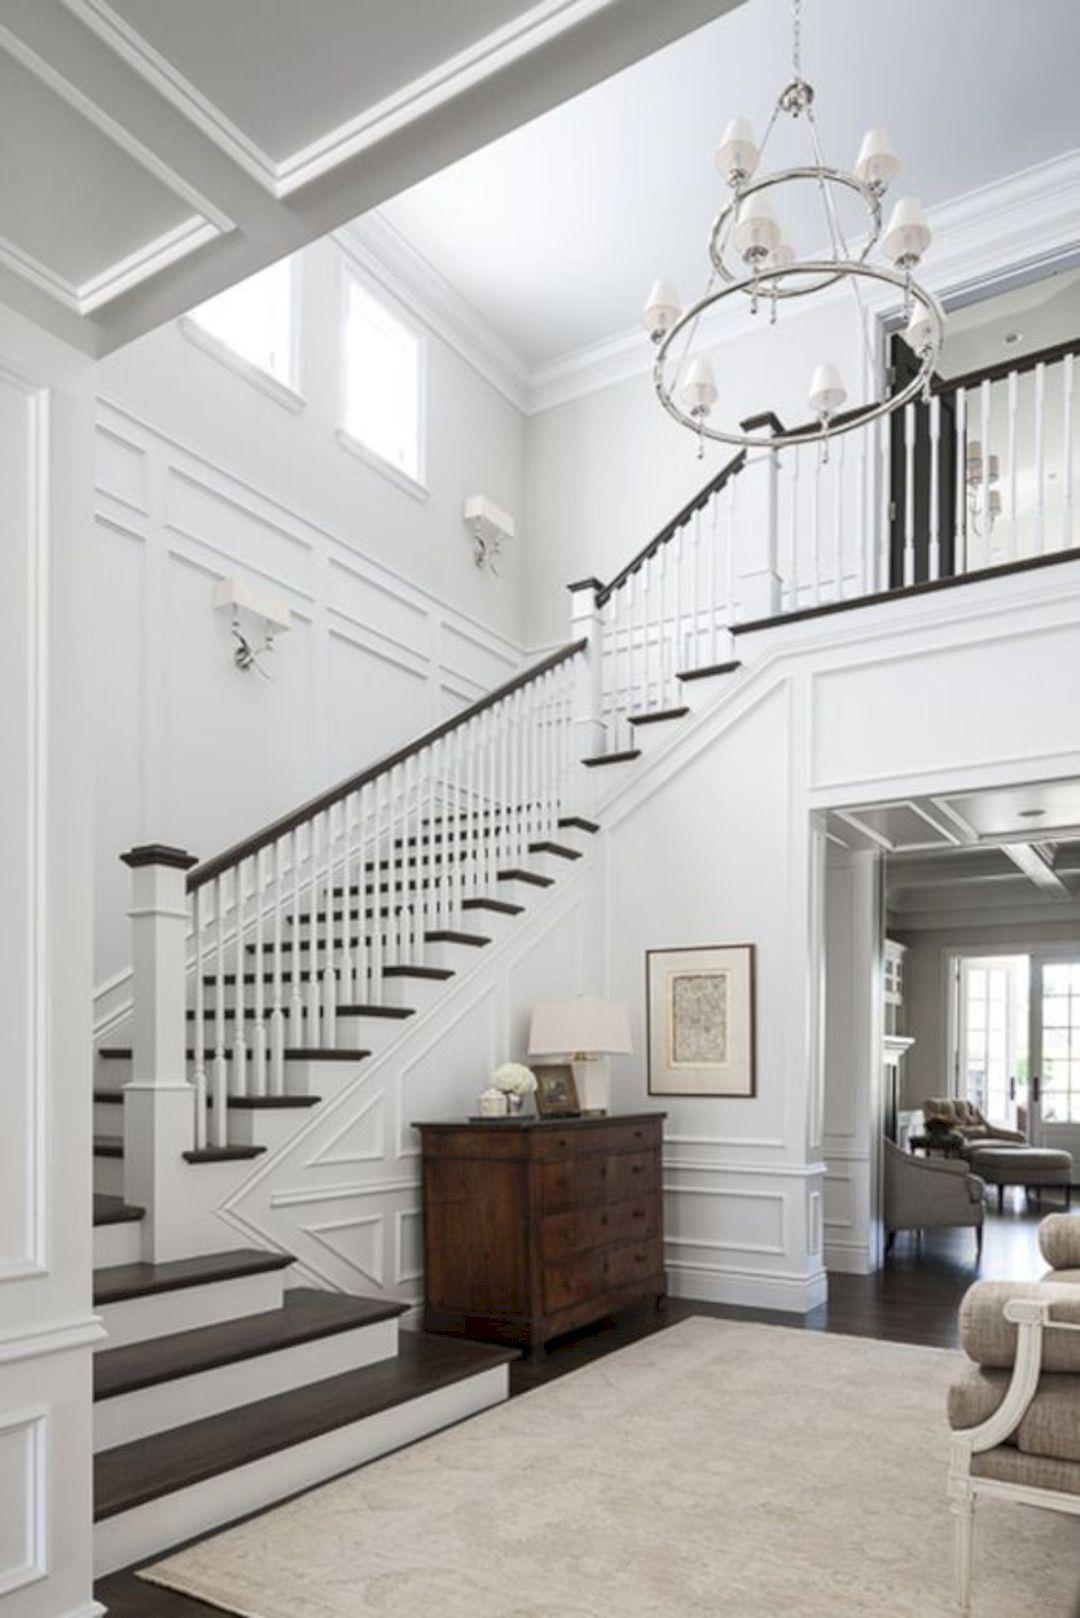 15 Luxury Staircase Ideas Https://www.futuristarchitecture.com/35291 Luxury  Staircase Ideas.html